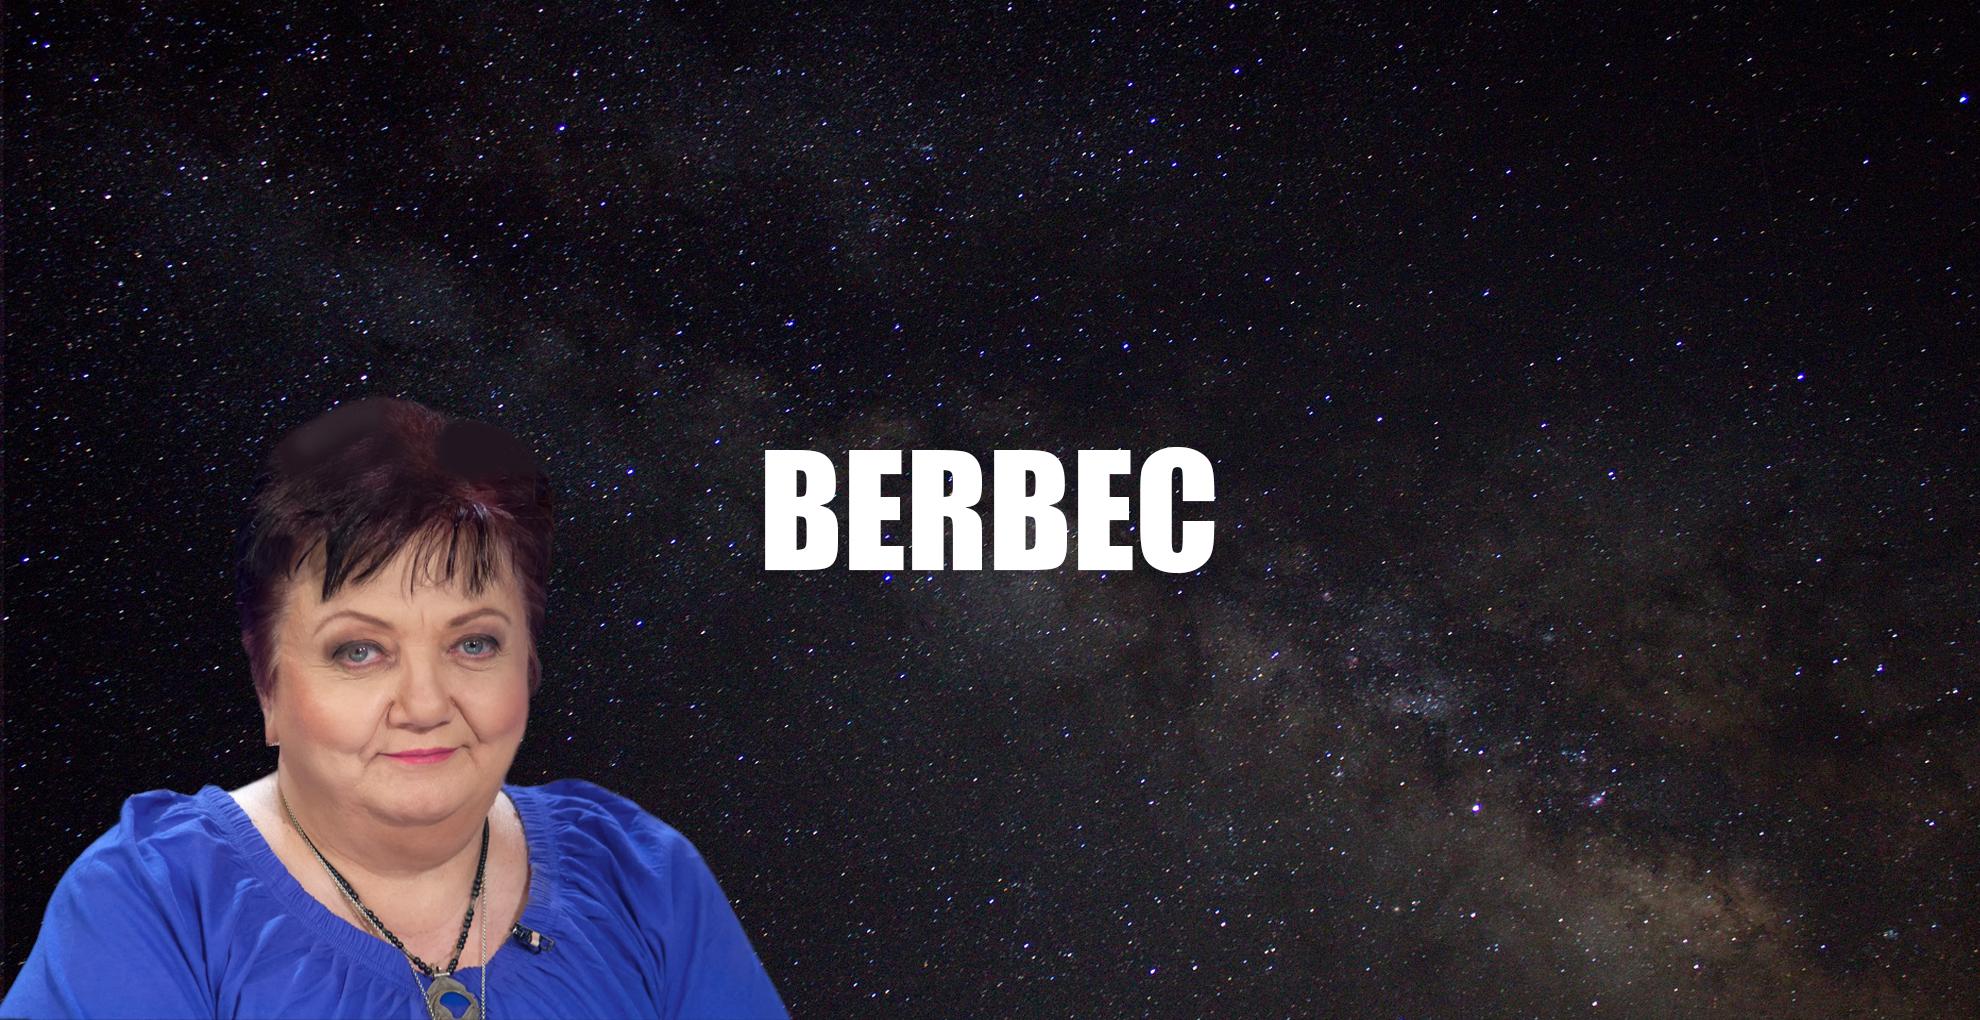 Horoscop Minerva iunie 2021 - Berbec